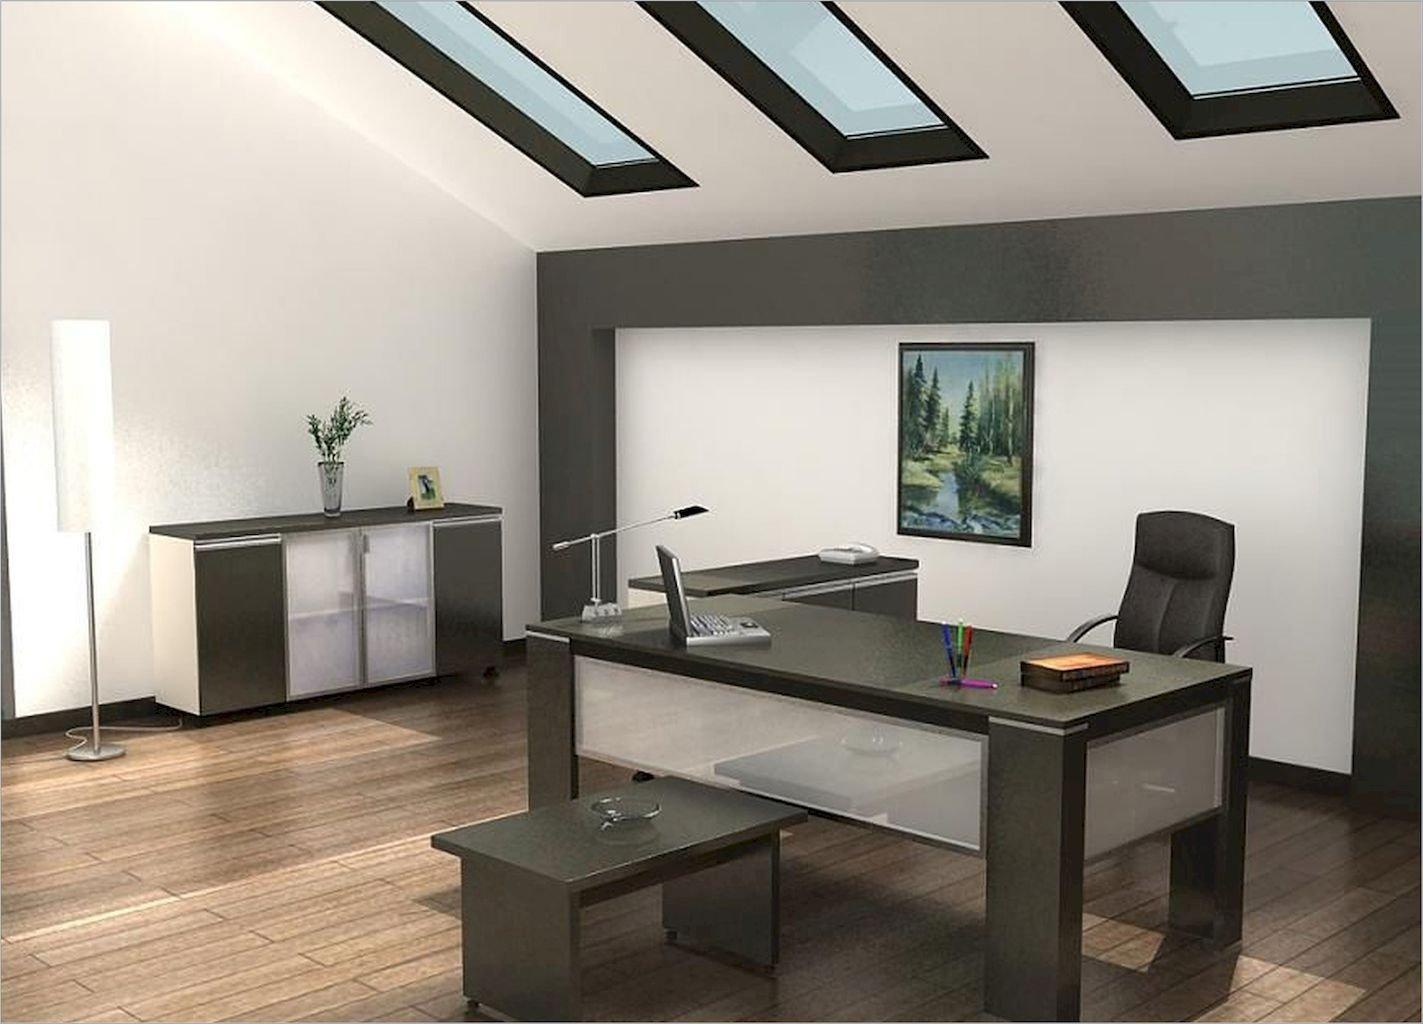 10 Attractive Office Decorating Ideas For Men 70 simple home office decor ideas for men idea man office desks